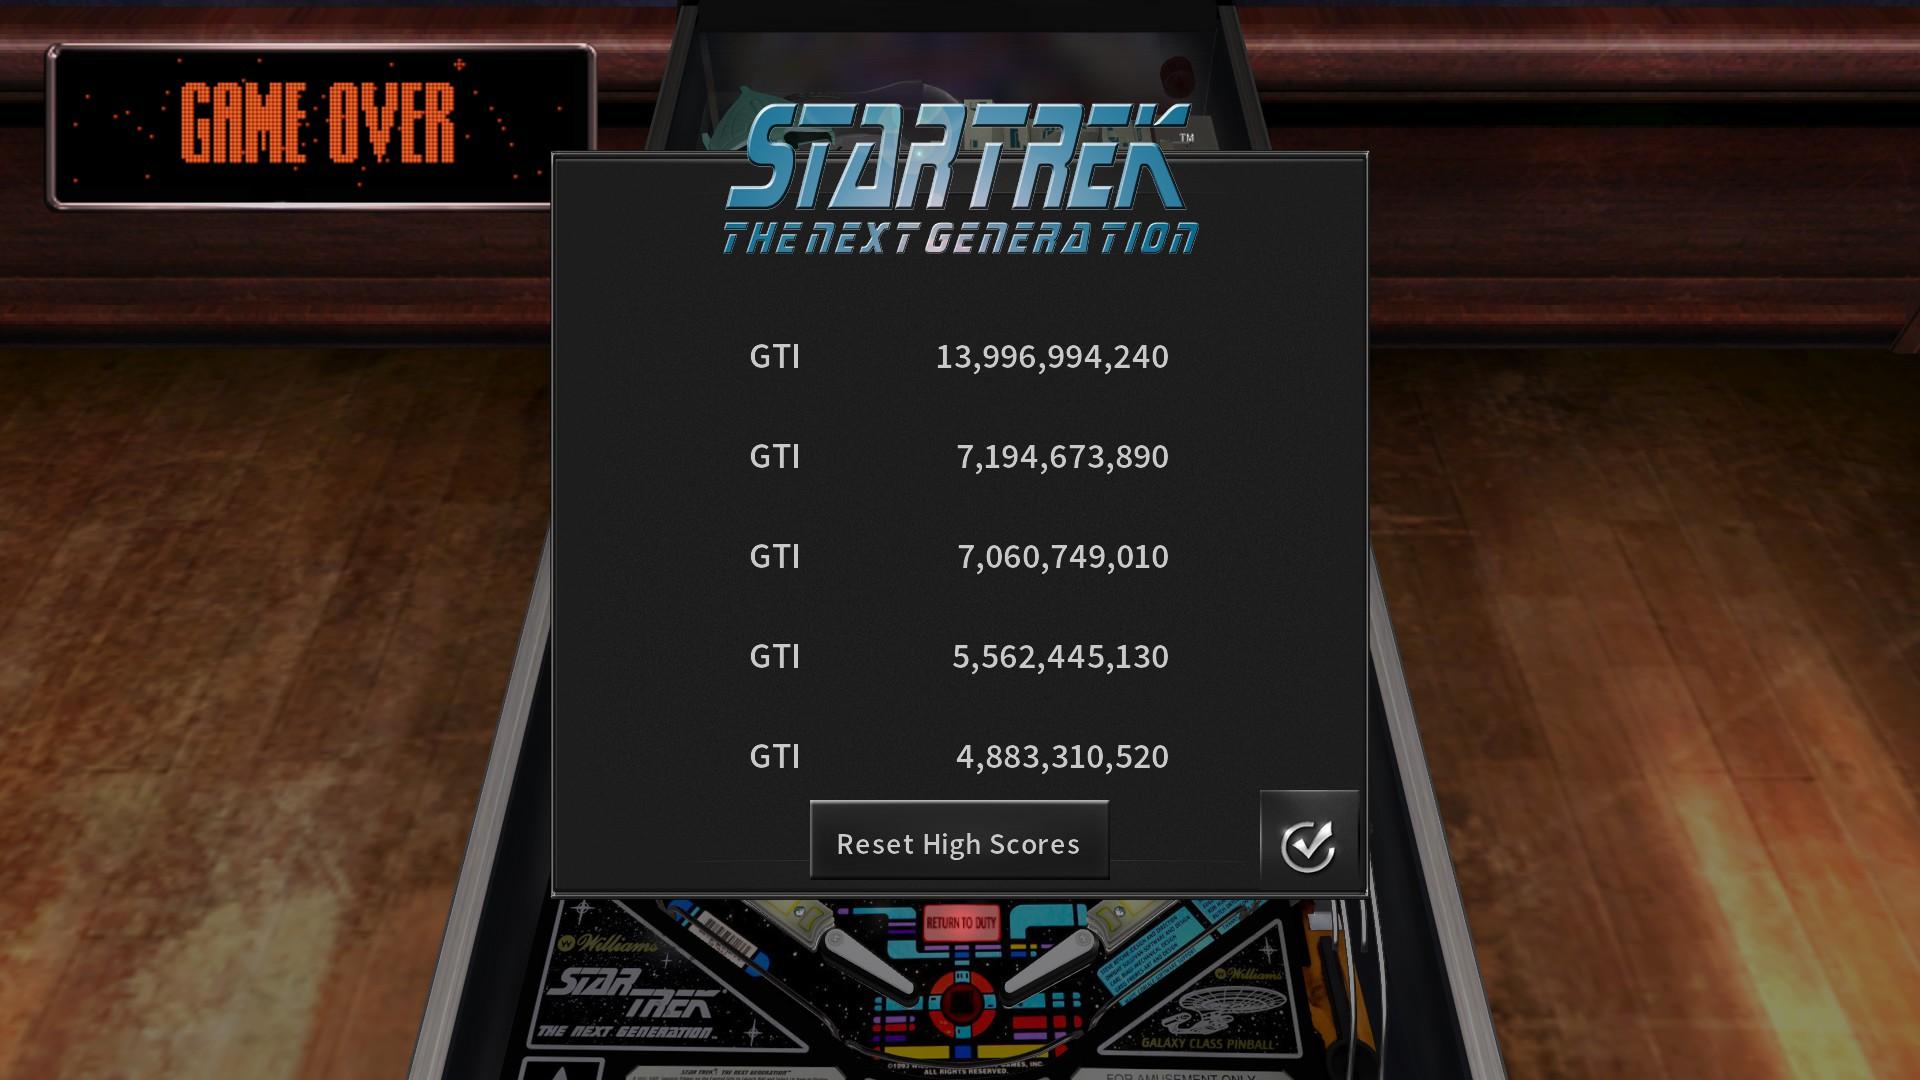 GTibel: Pinball Arcade: Star Trek: The Next Generation (PC) 13,996,994,240 points on 2020-07-22 10:07:47